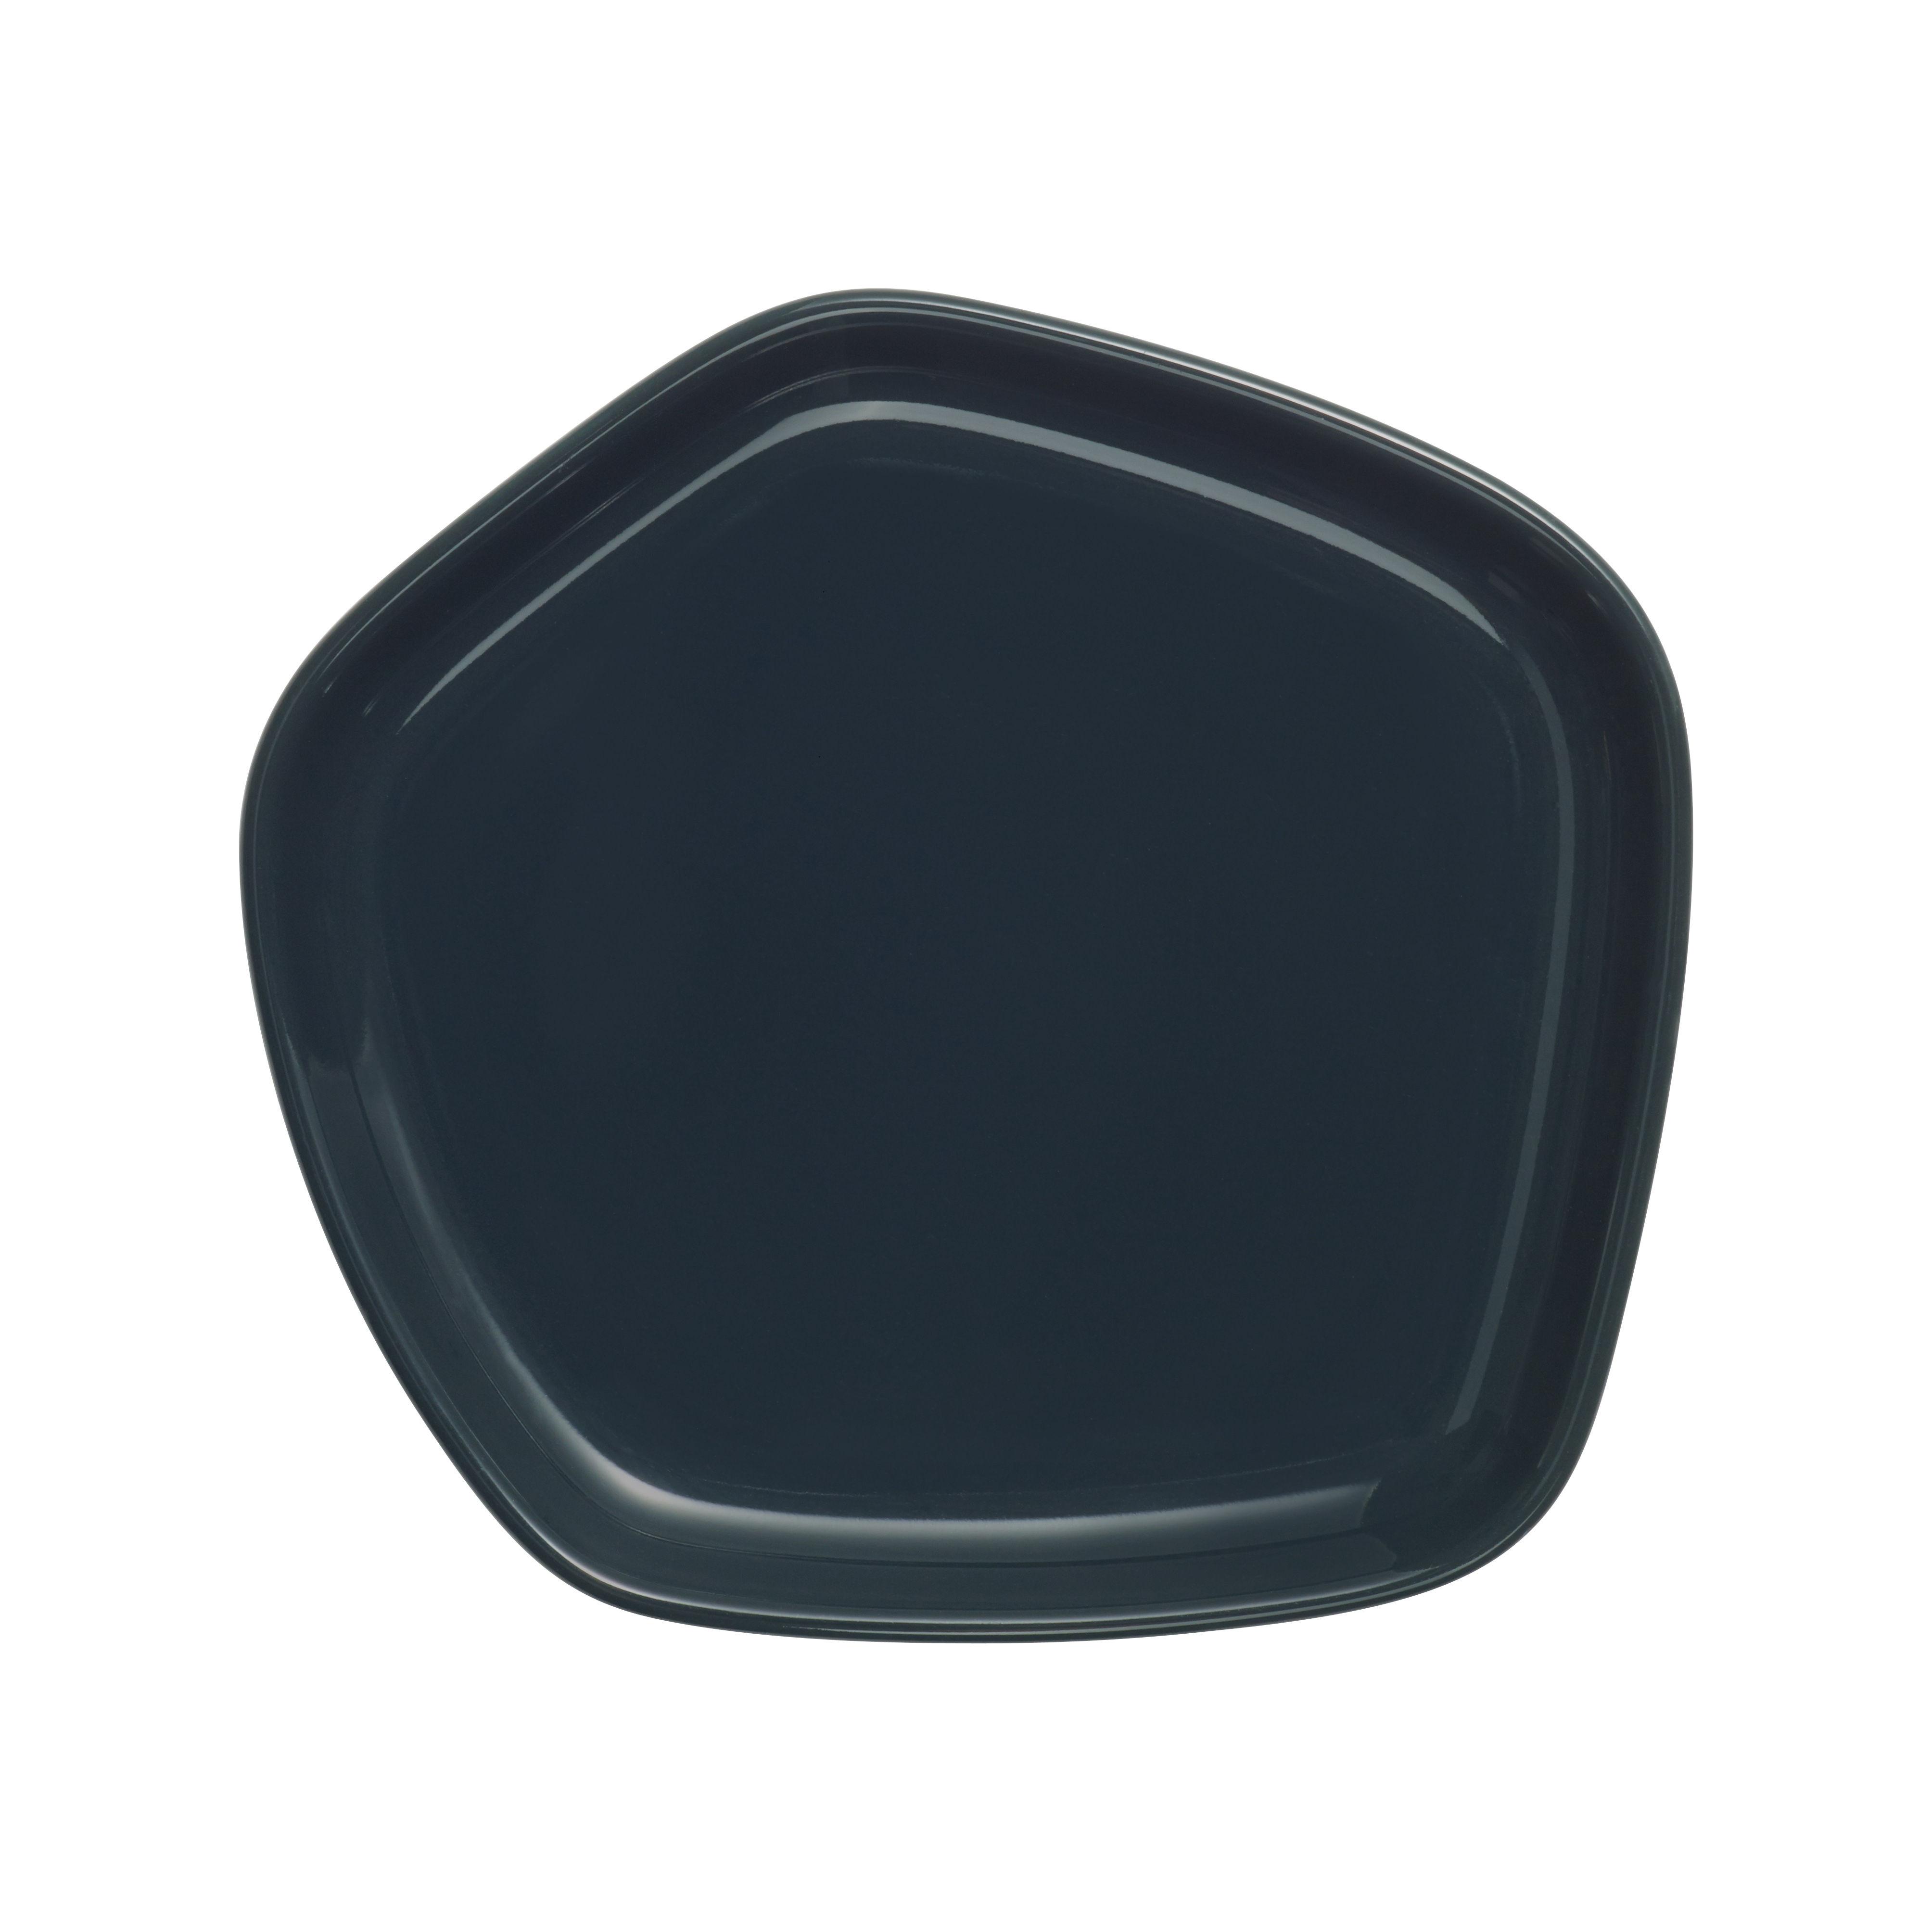 Arts de la table - Saladiers, coupes et bols - Coupelle Iittala X Issey Miyake / Ø 11 cm - Iittala - Vert foncé - Porcelaine